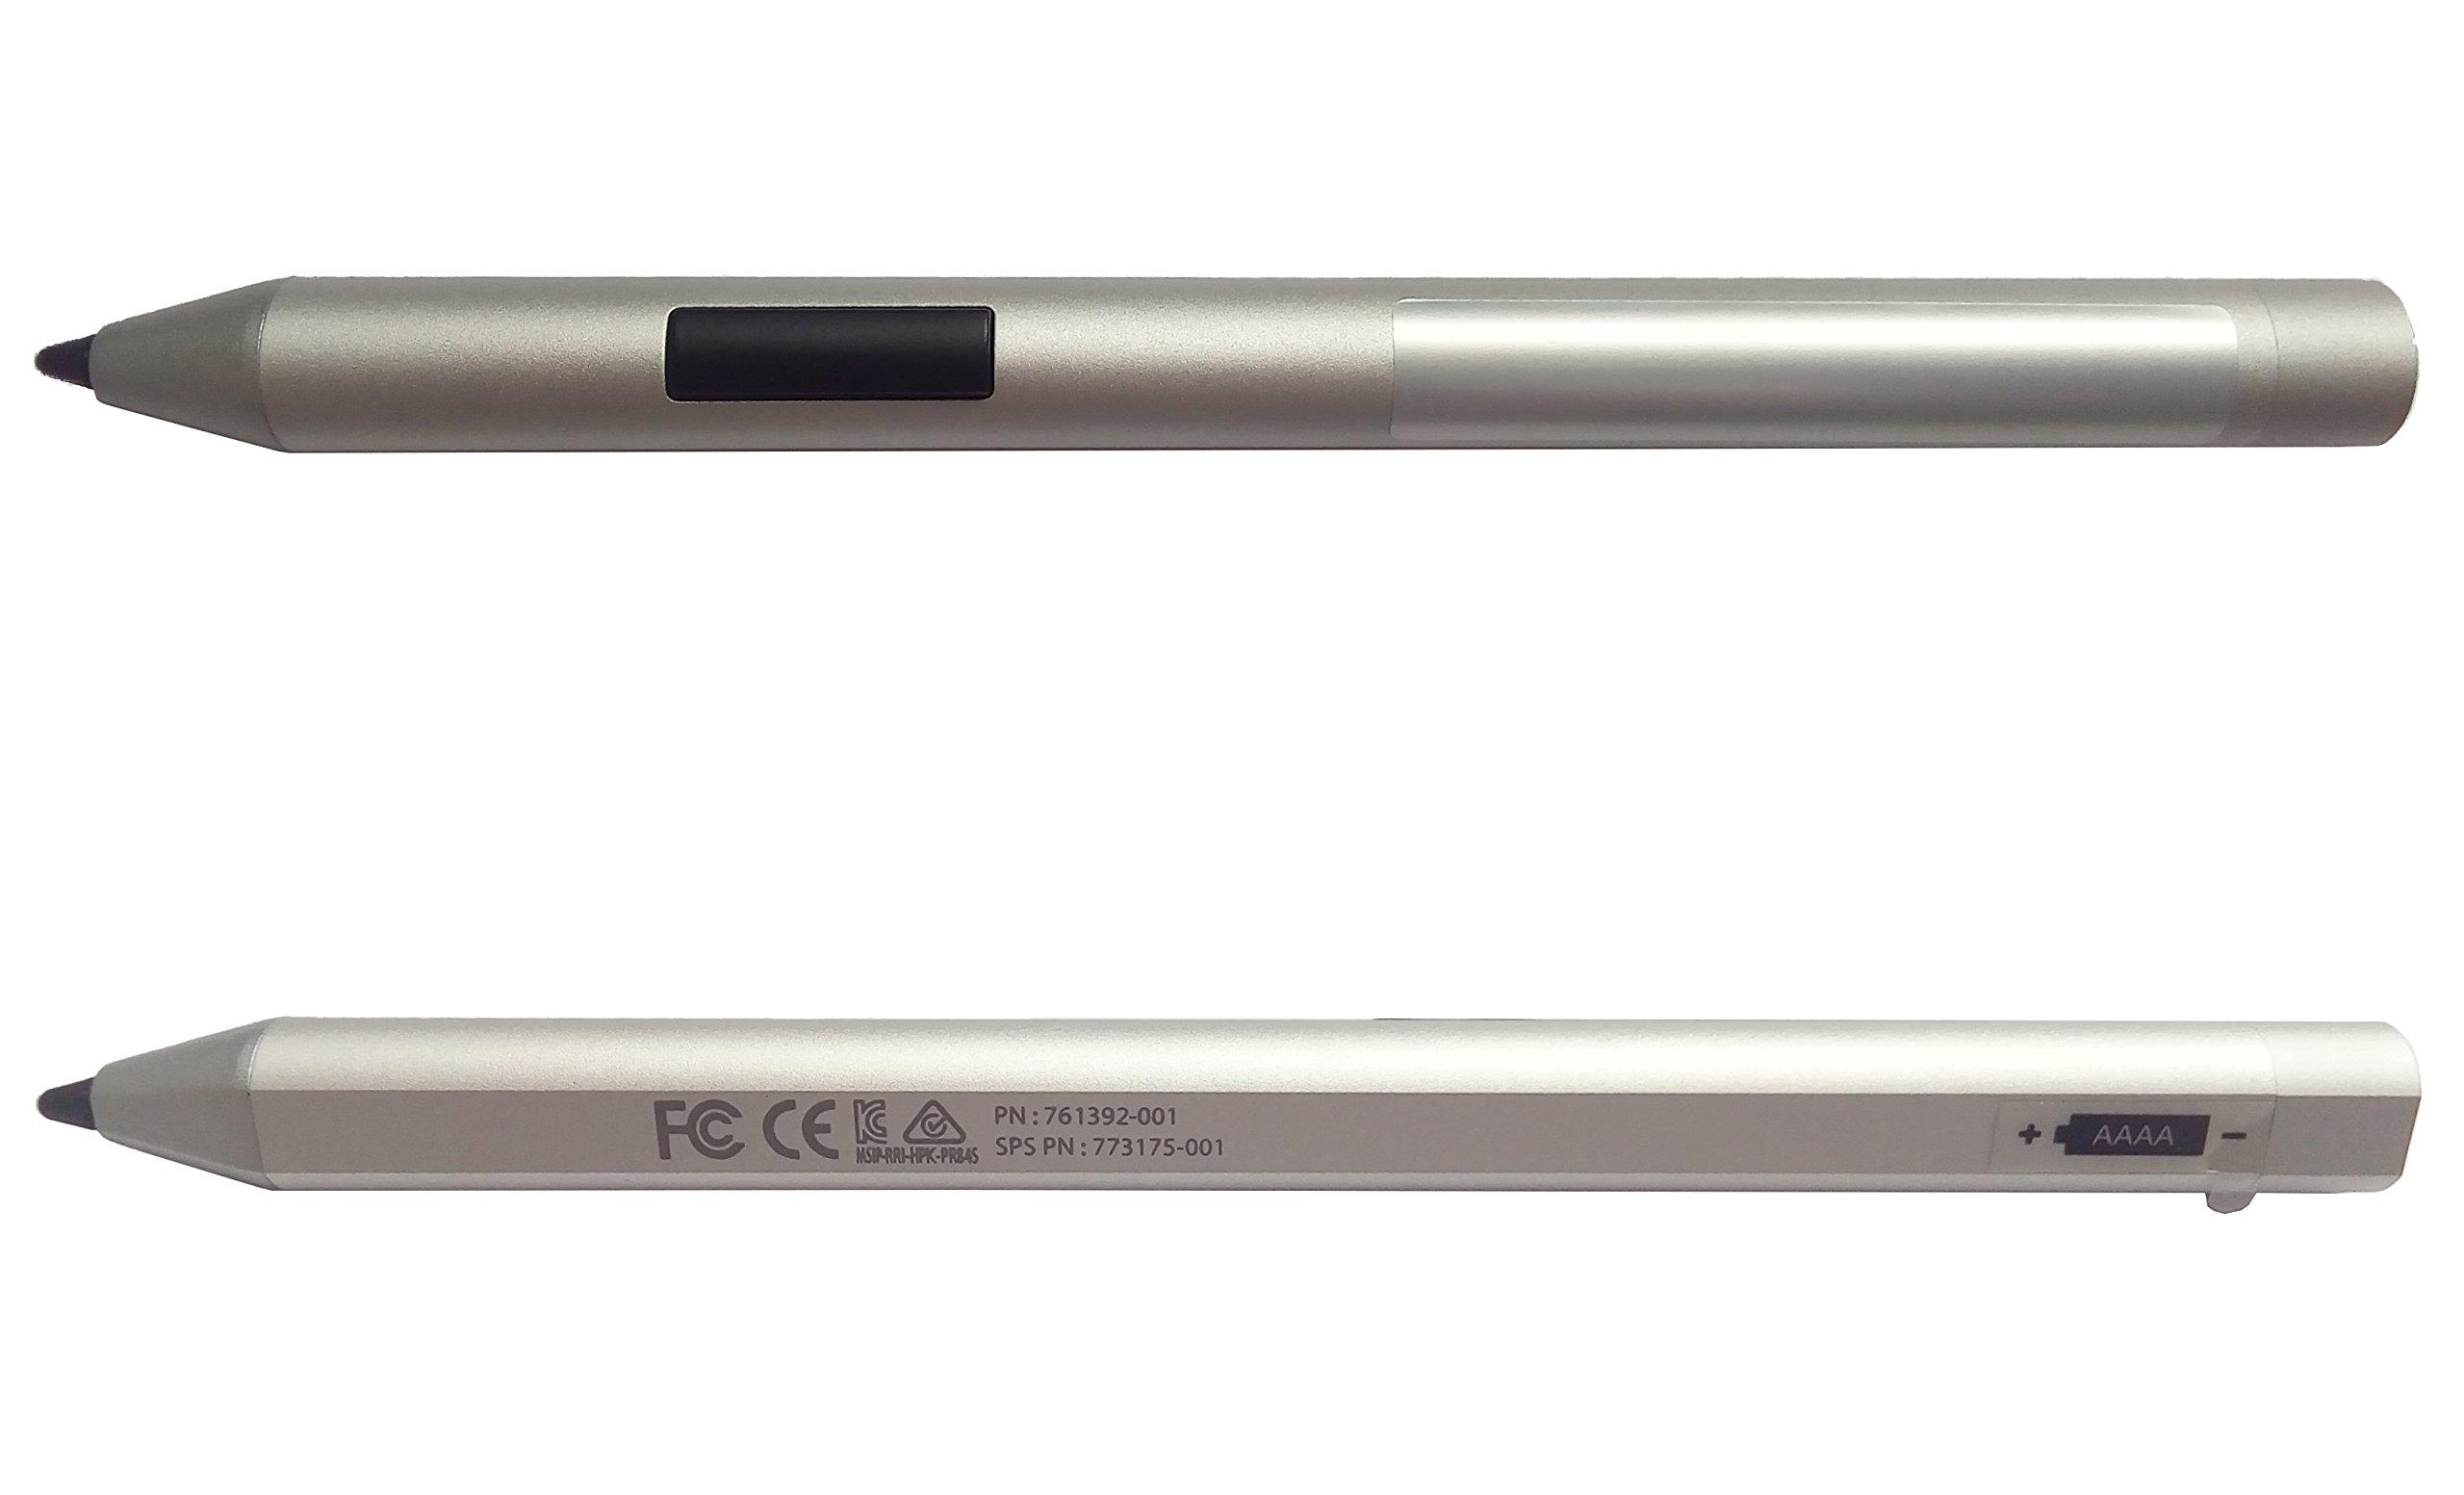 Active Digitizer Stylus Pen - Digital Pen for HP Spectre x360 13-40xx, Spectre x360 13-41xx, Spectre x360 15-ap0xx (NOT FIT : Spectre x360 13-ac0xx, Spectre x360 13-ae000 or More)